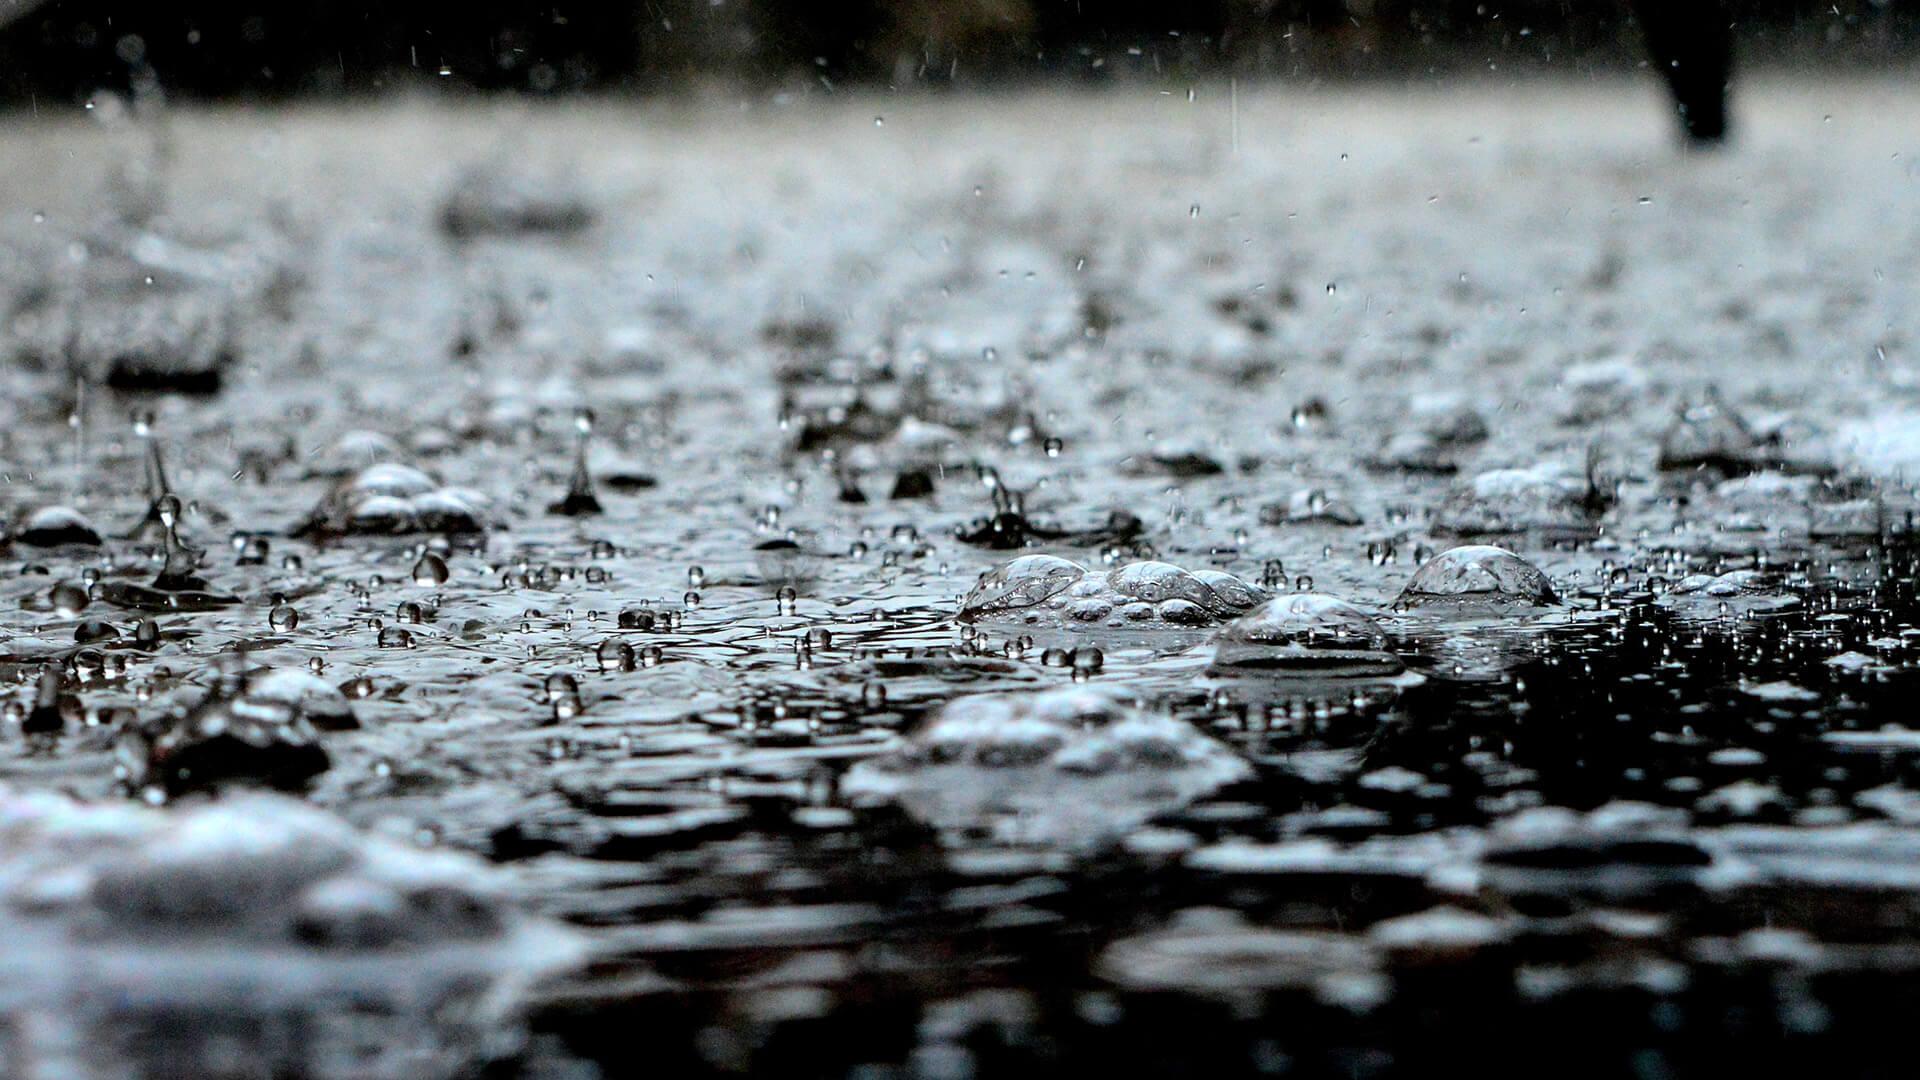 RC Dorff, Team Road, Saisonauftakt wegen Regen verschoben